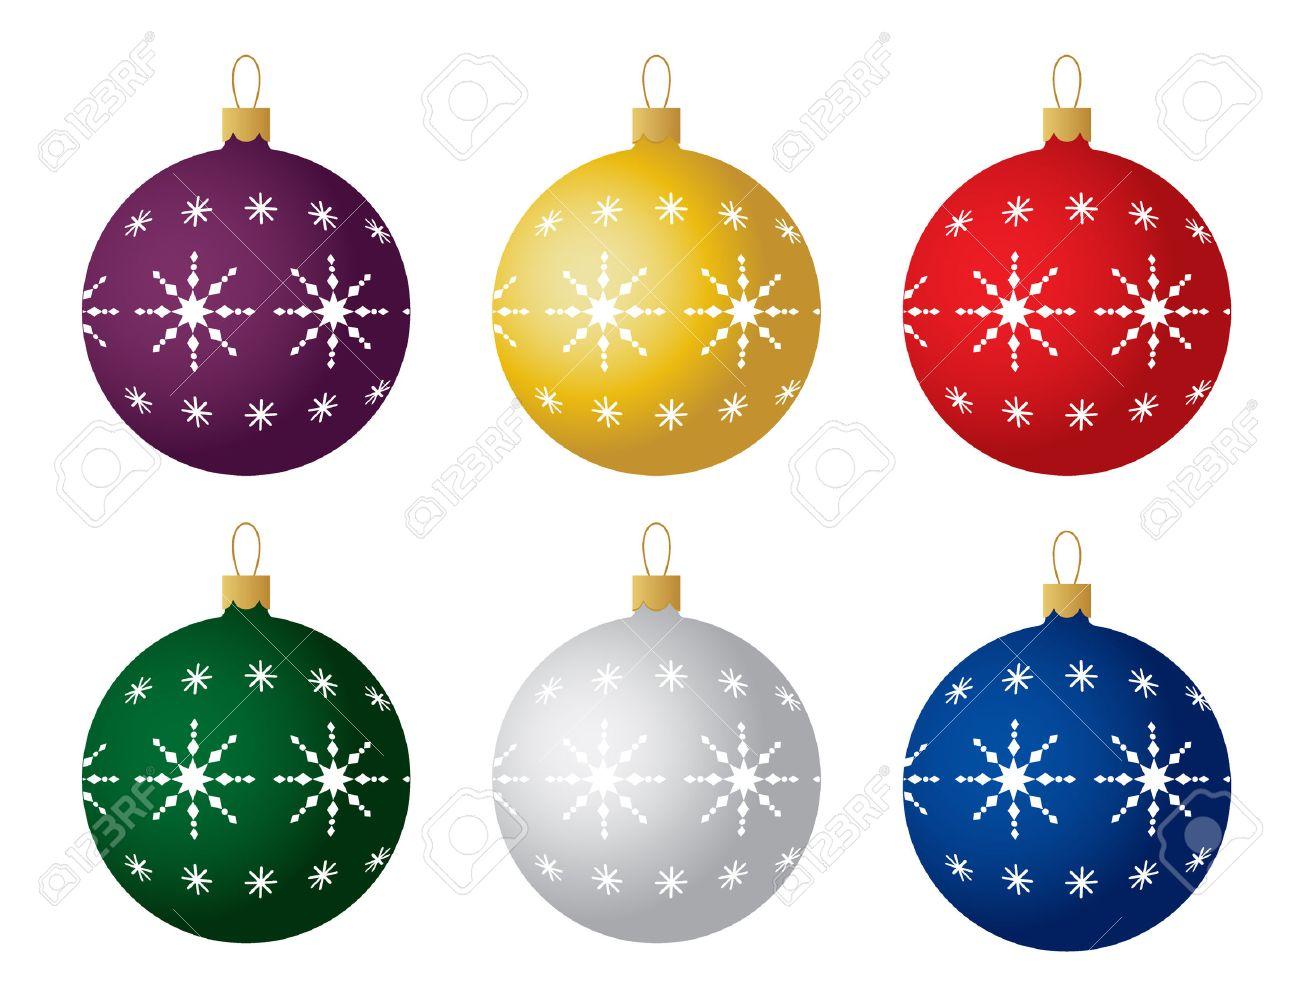 Christmas Ornaments Vector.Set Of Six Christmas Ornaments Vector